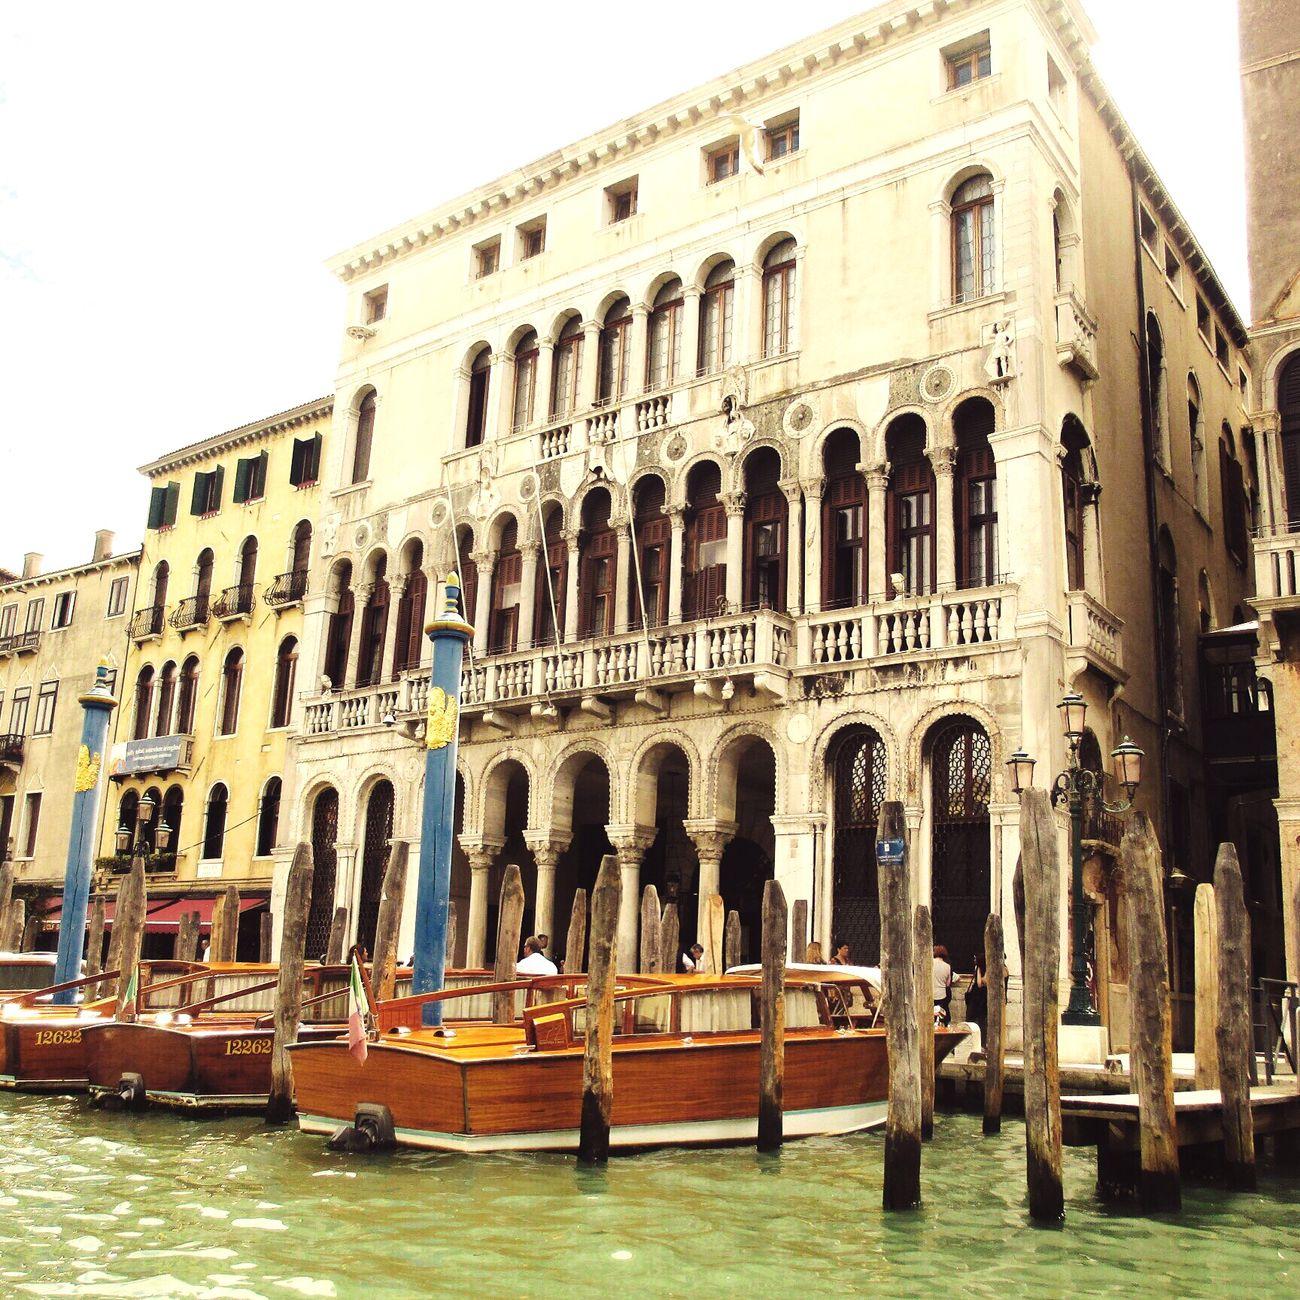 Venecia Puerto Venecia Porto Venecia  Venezia Venezia #venice Venezia.italia Venezia Italia Veneziaunica Venezia Venice Veneziano